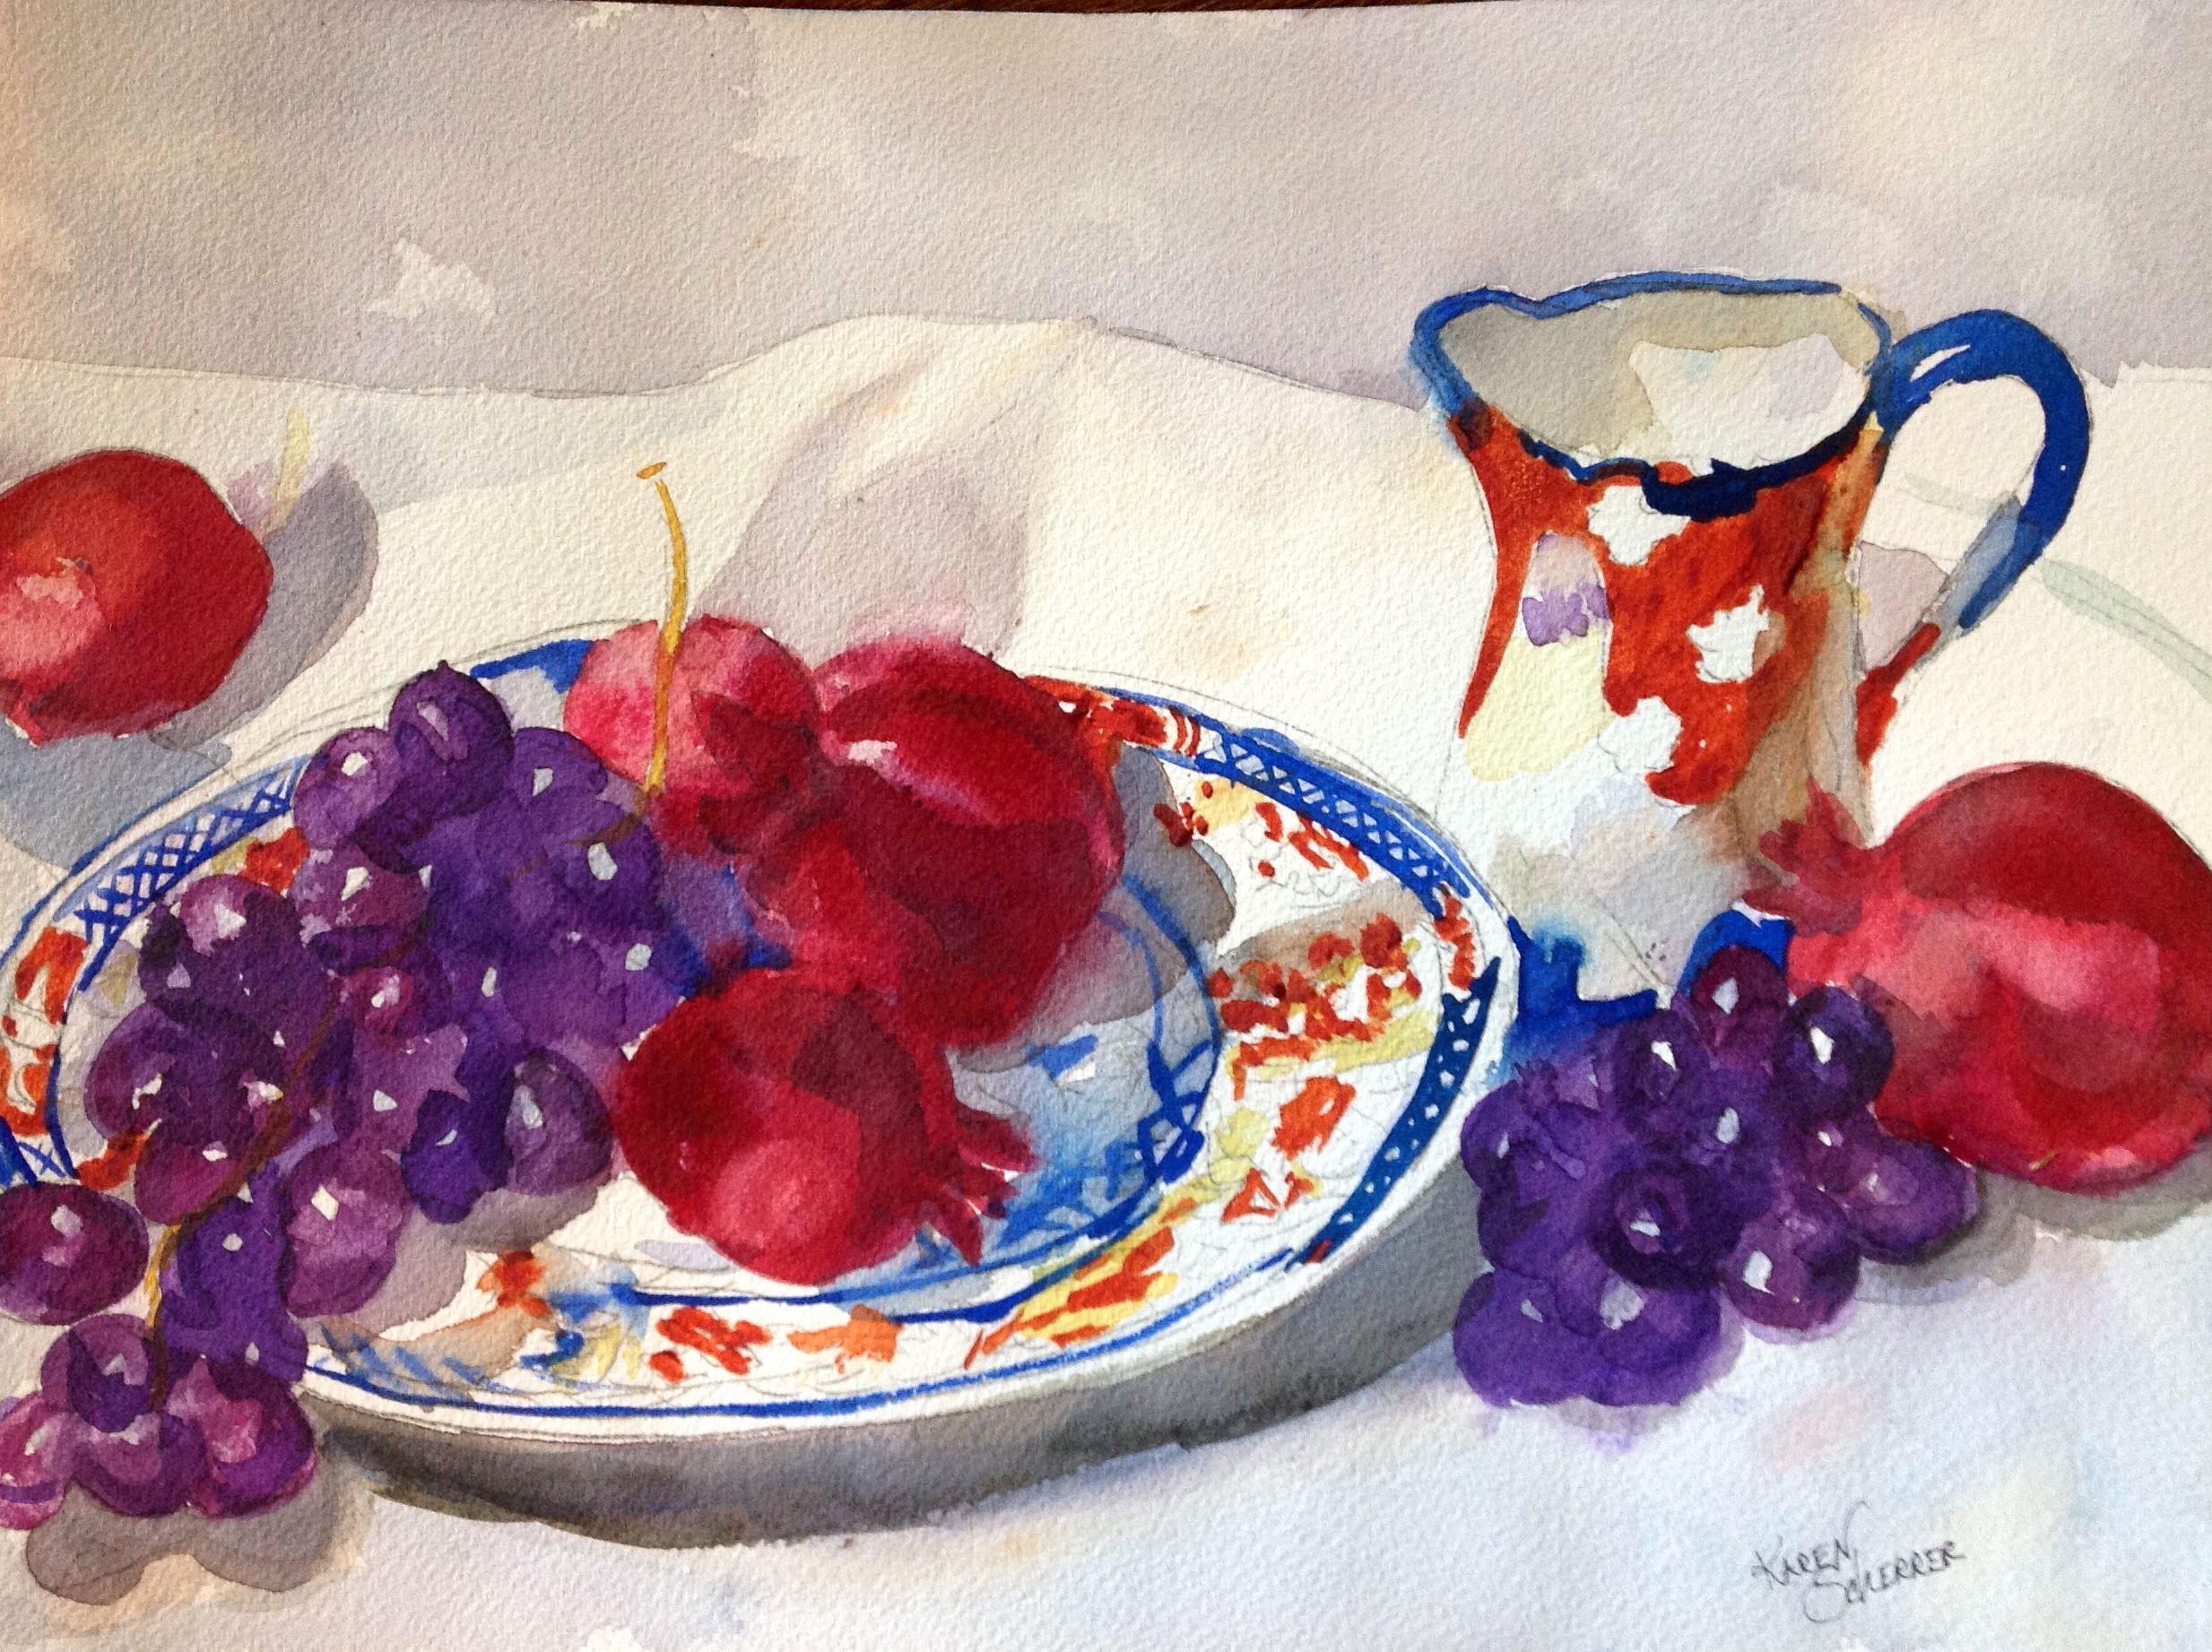 Watercolor artists in texas -  Persimmons On A Plate By Texas Watercolor Artist Karen Scherrer